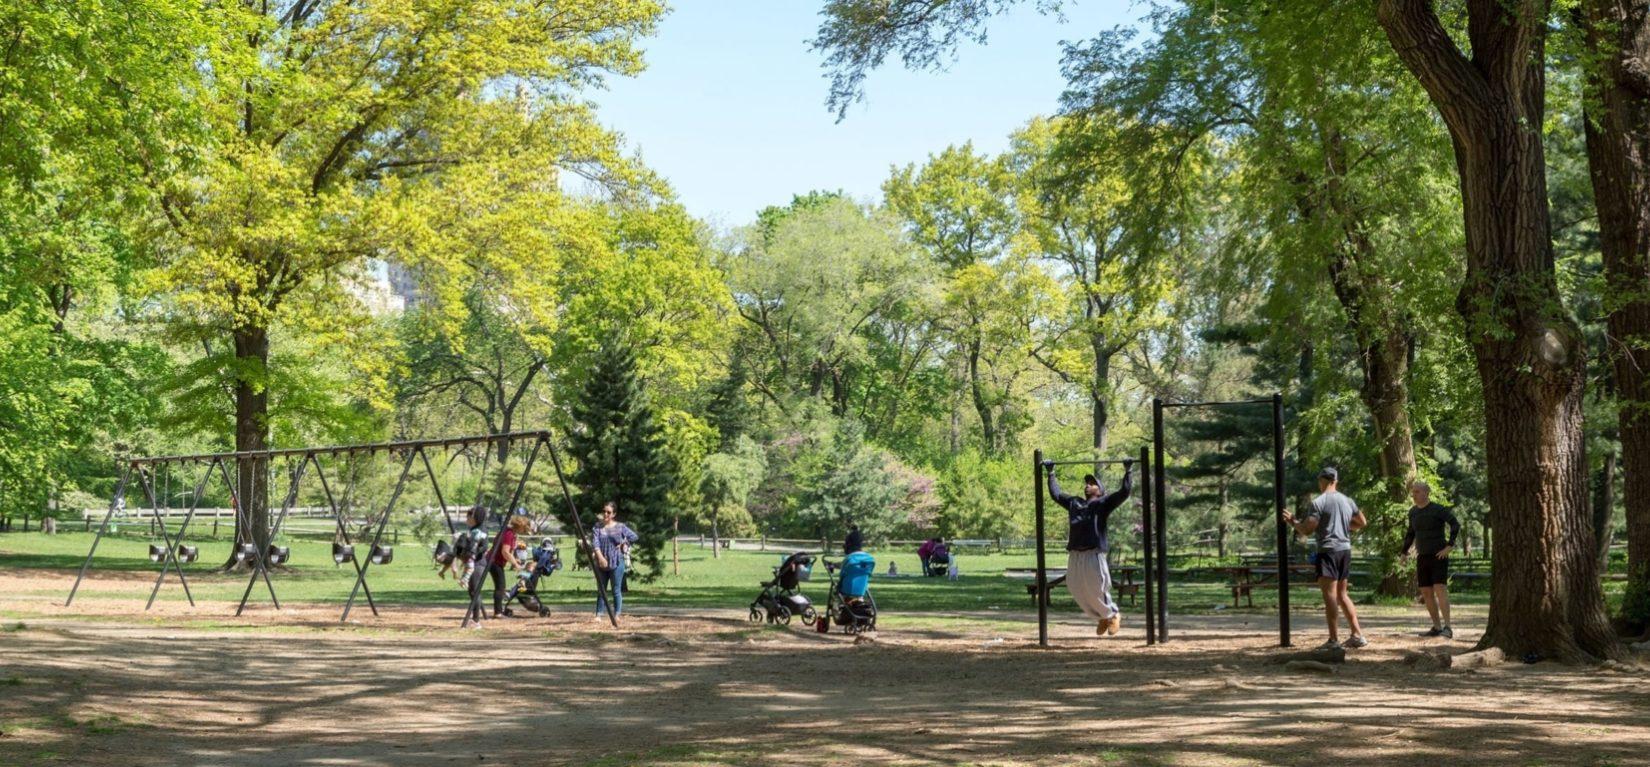 Ff wide 3x Pinetum Playground